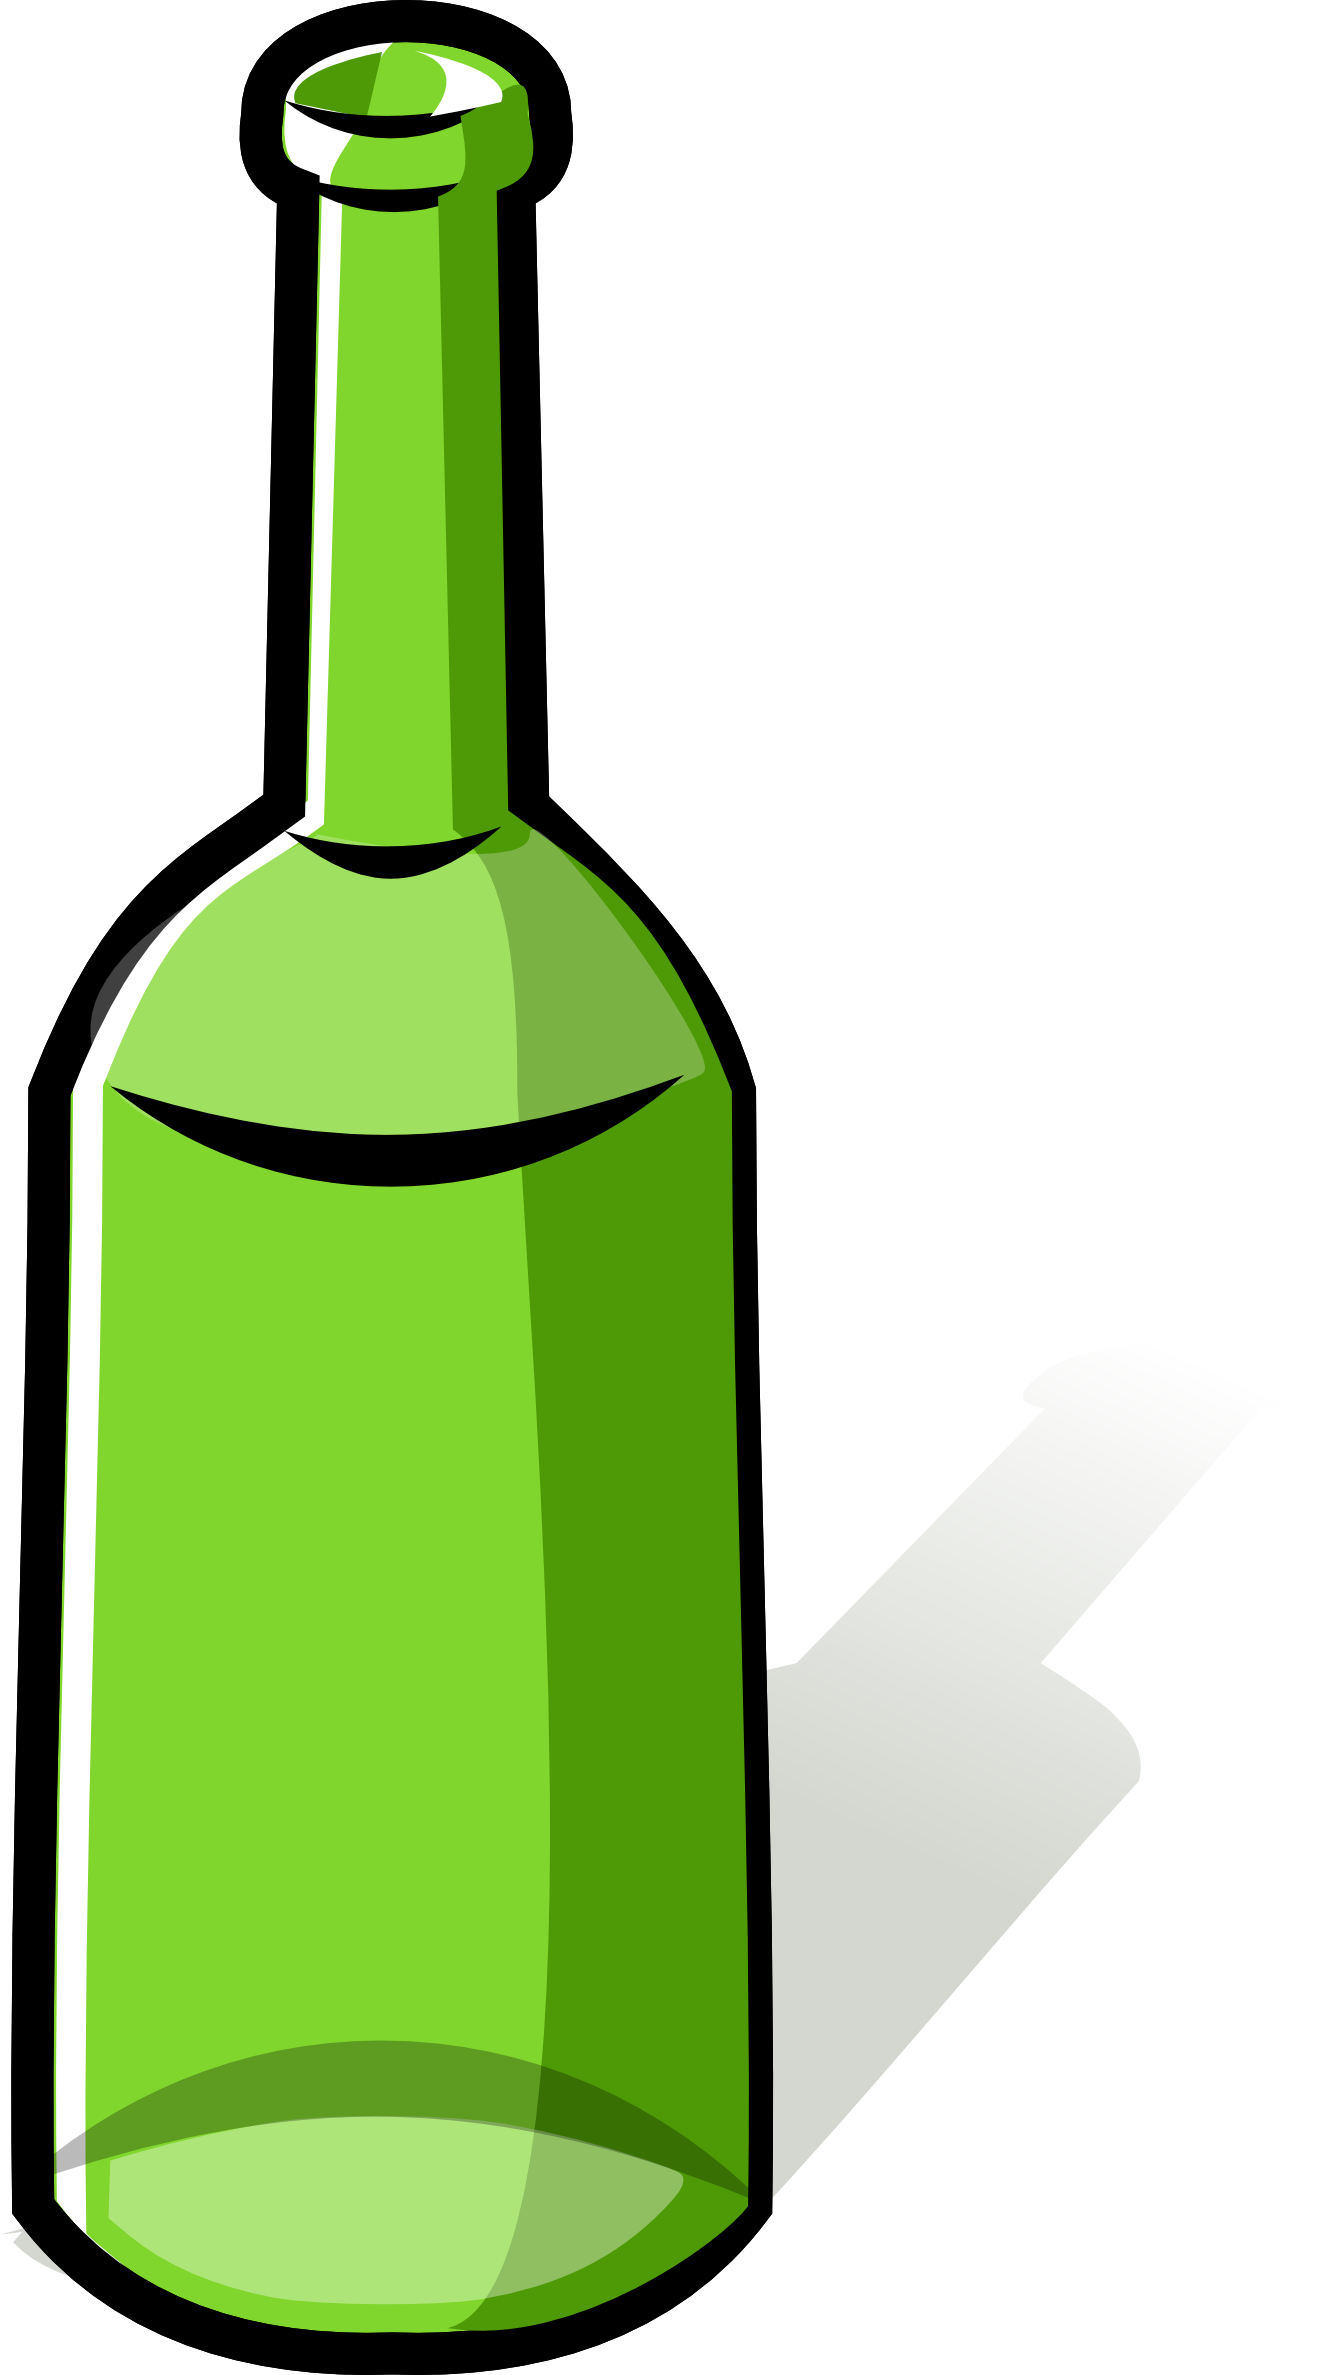 collection of bottle. Glasses clipart lemonade